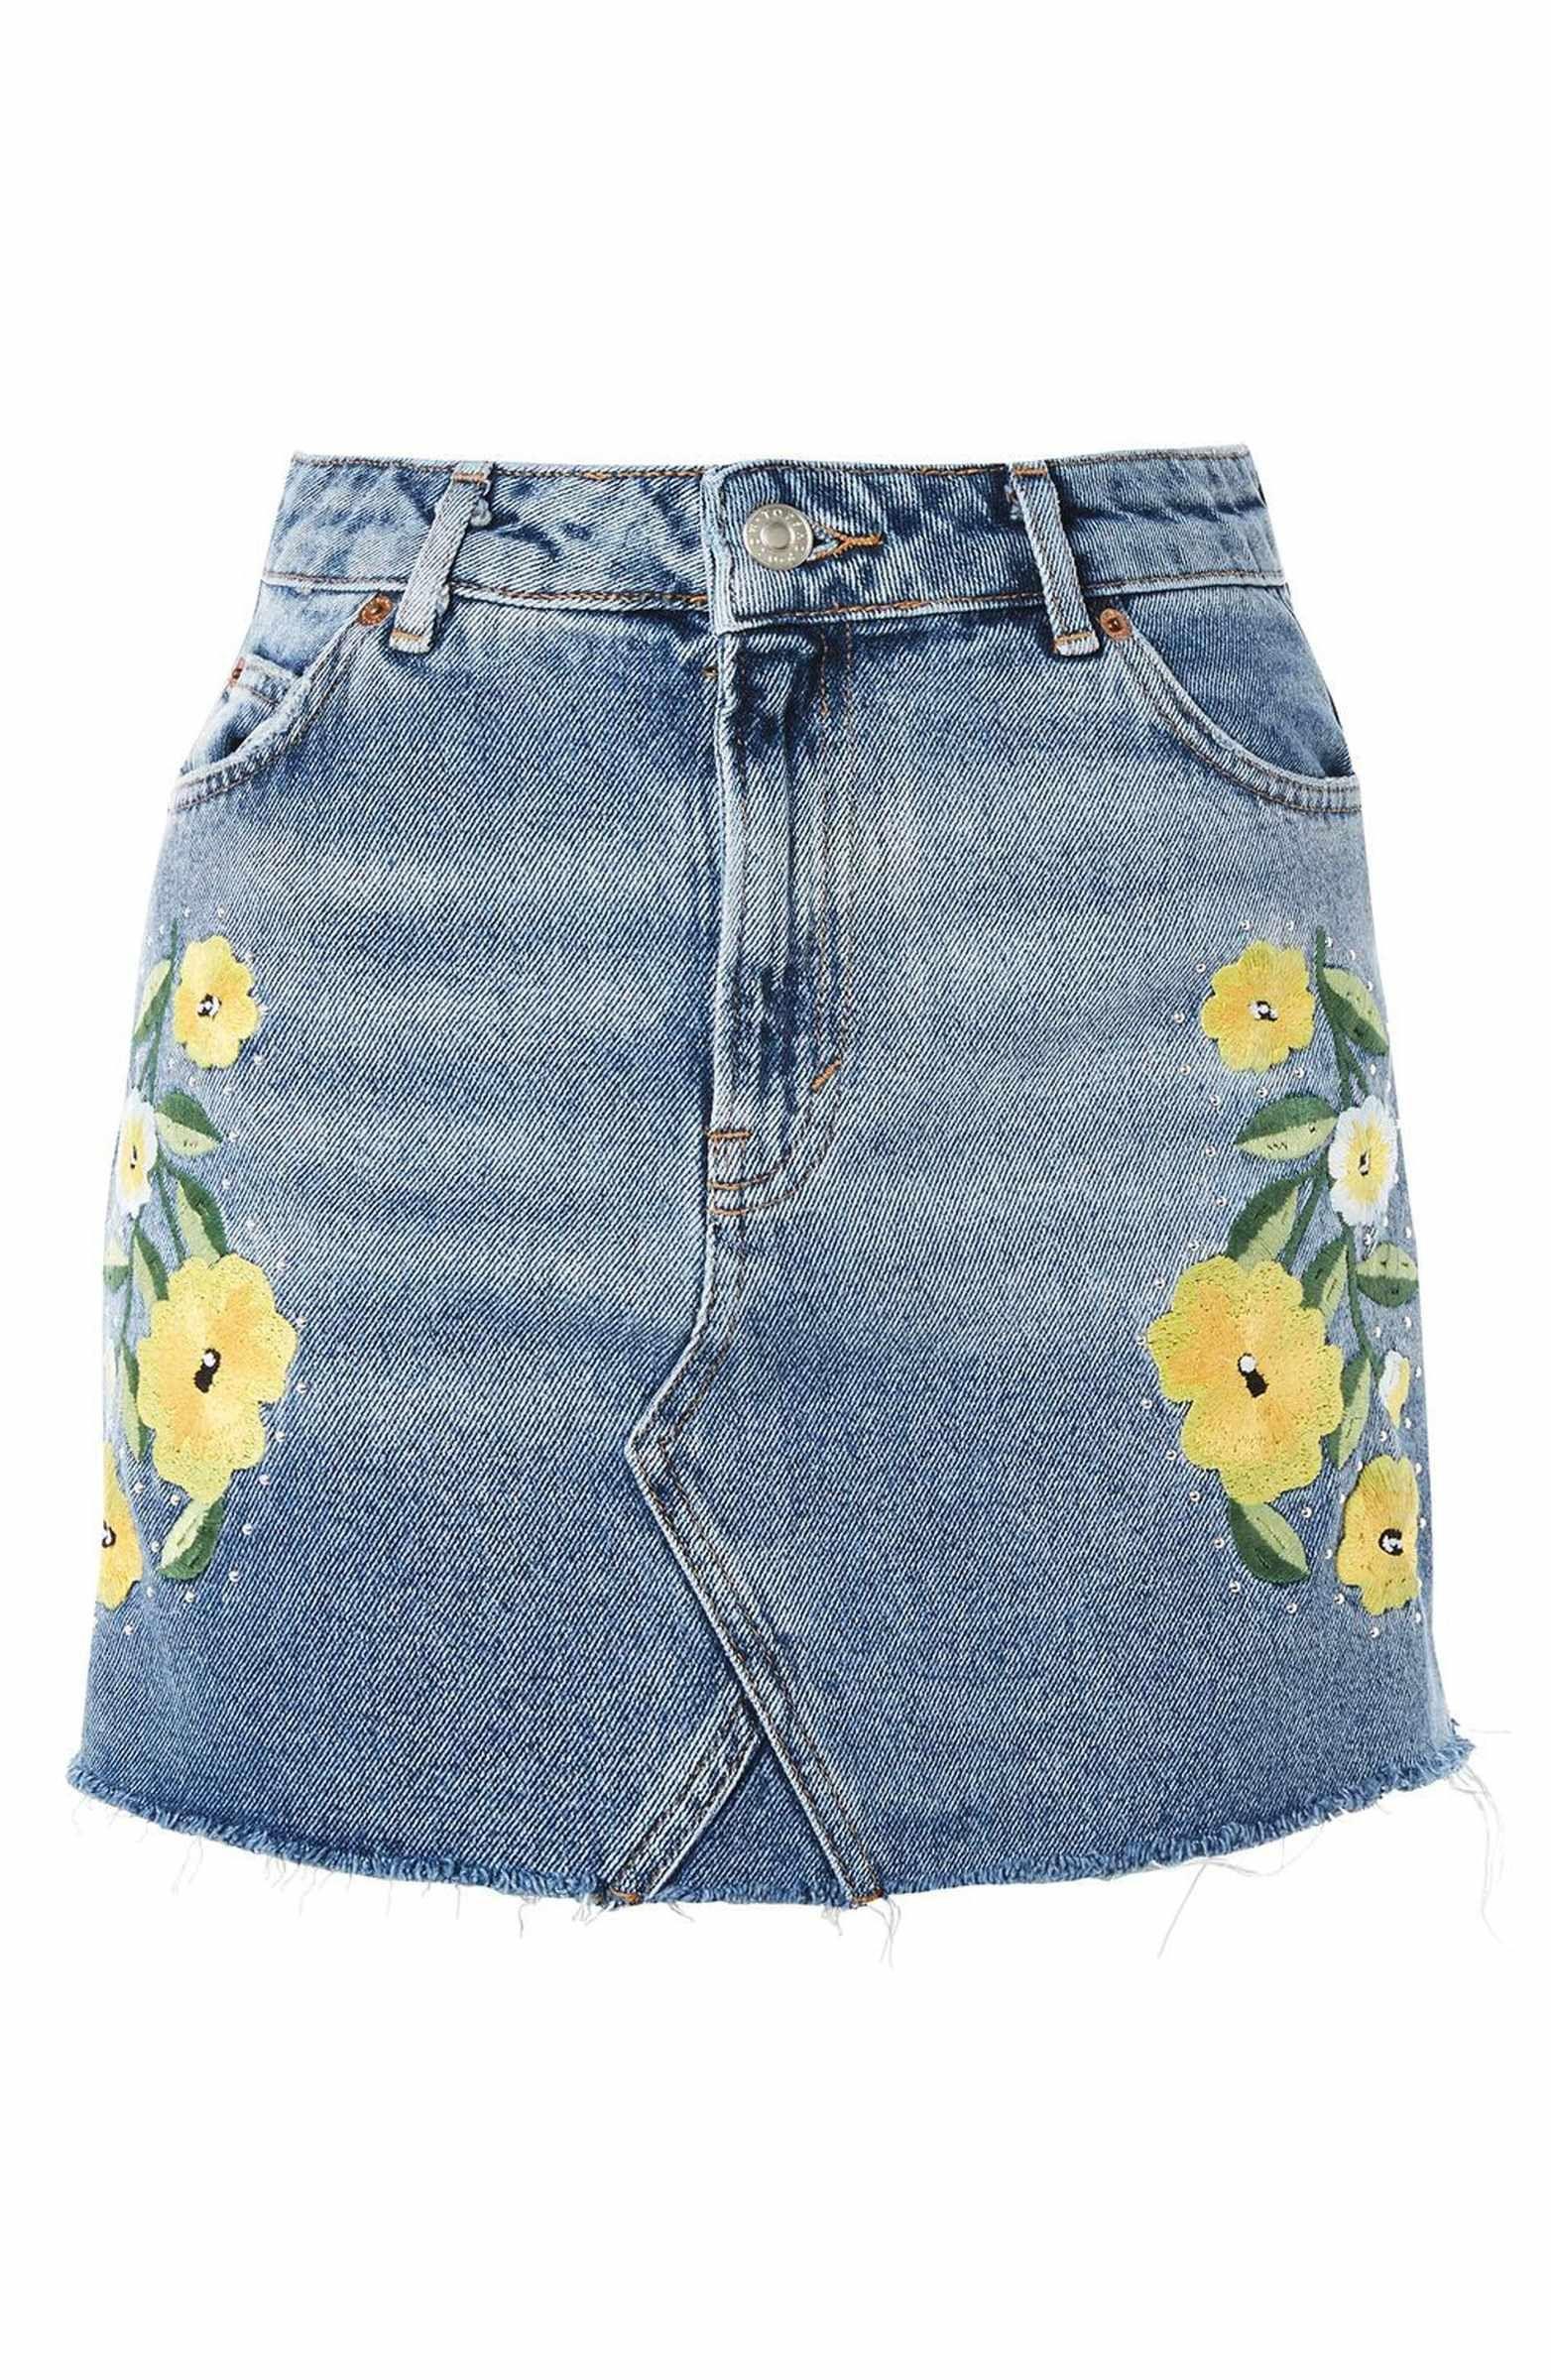 1fd3f0de31 Main Image - Topshop Floral Stud Denim Miniskirt | style | Studded ...